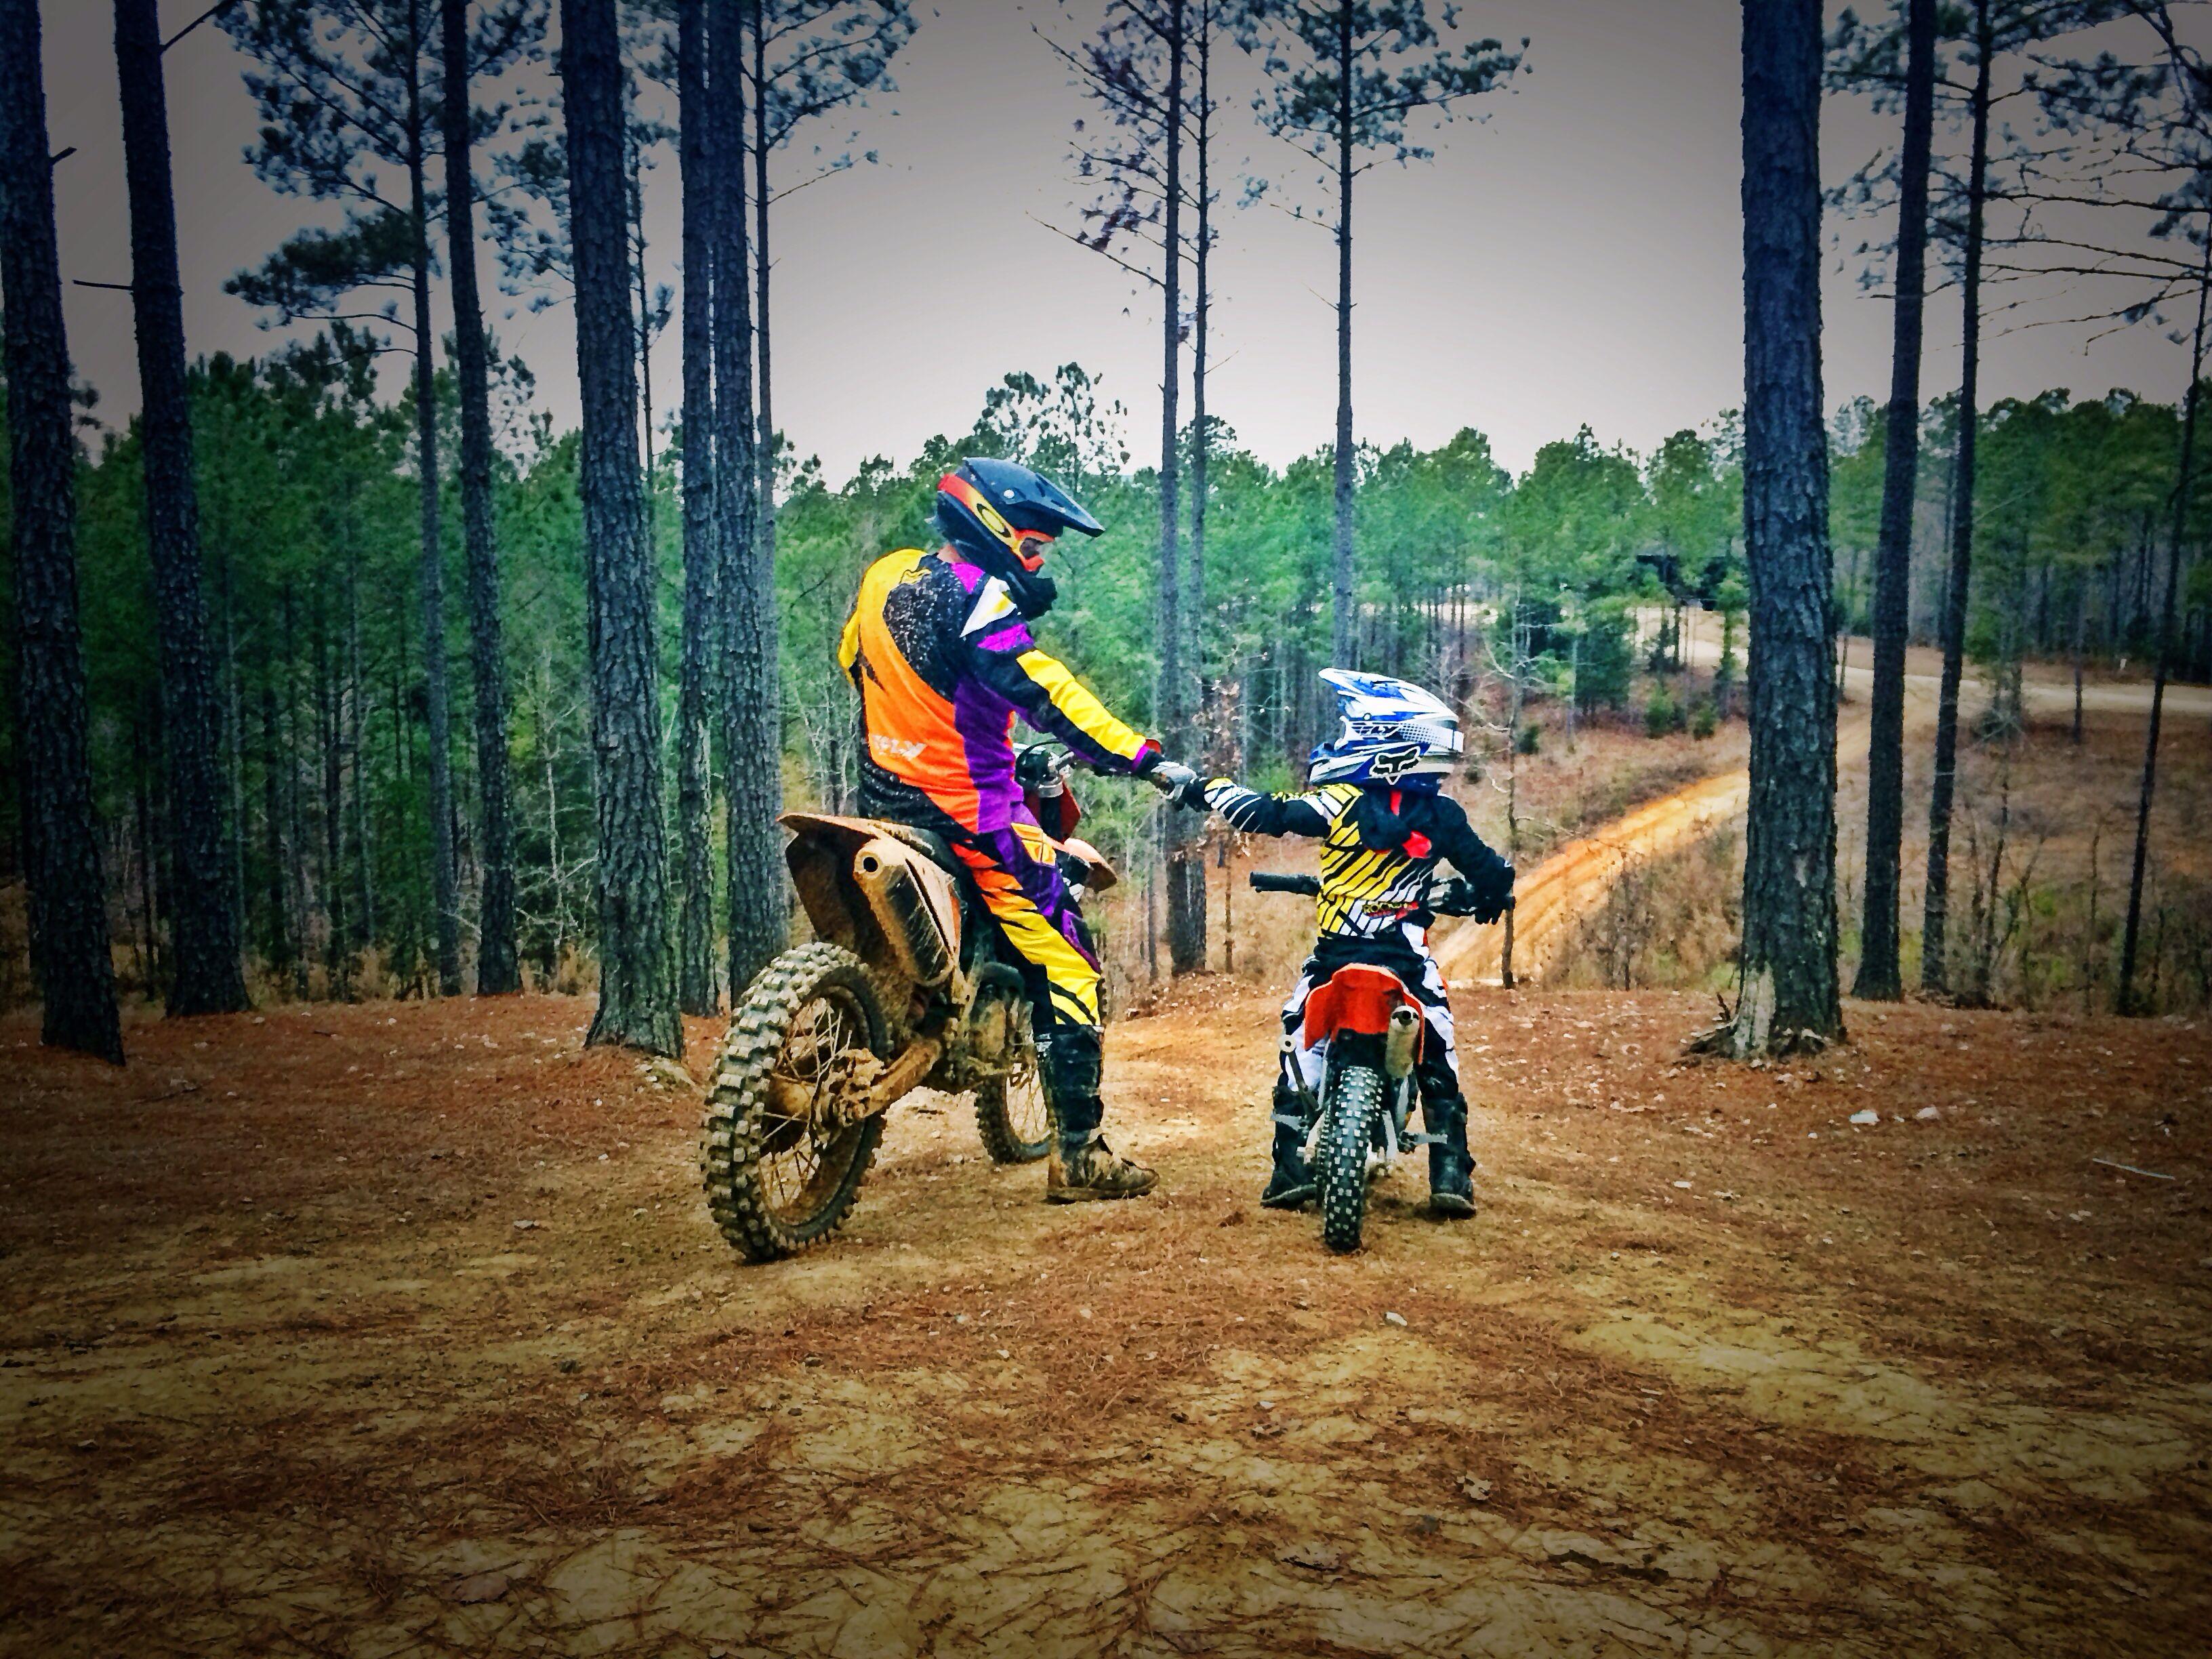 173 best i dig dirt bikes images on pinterest dirt biking